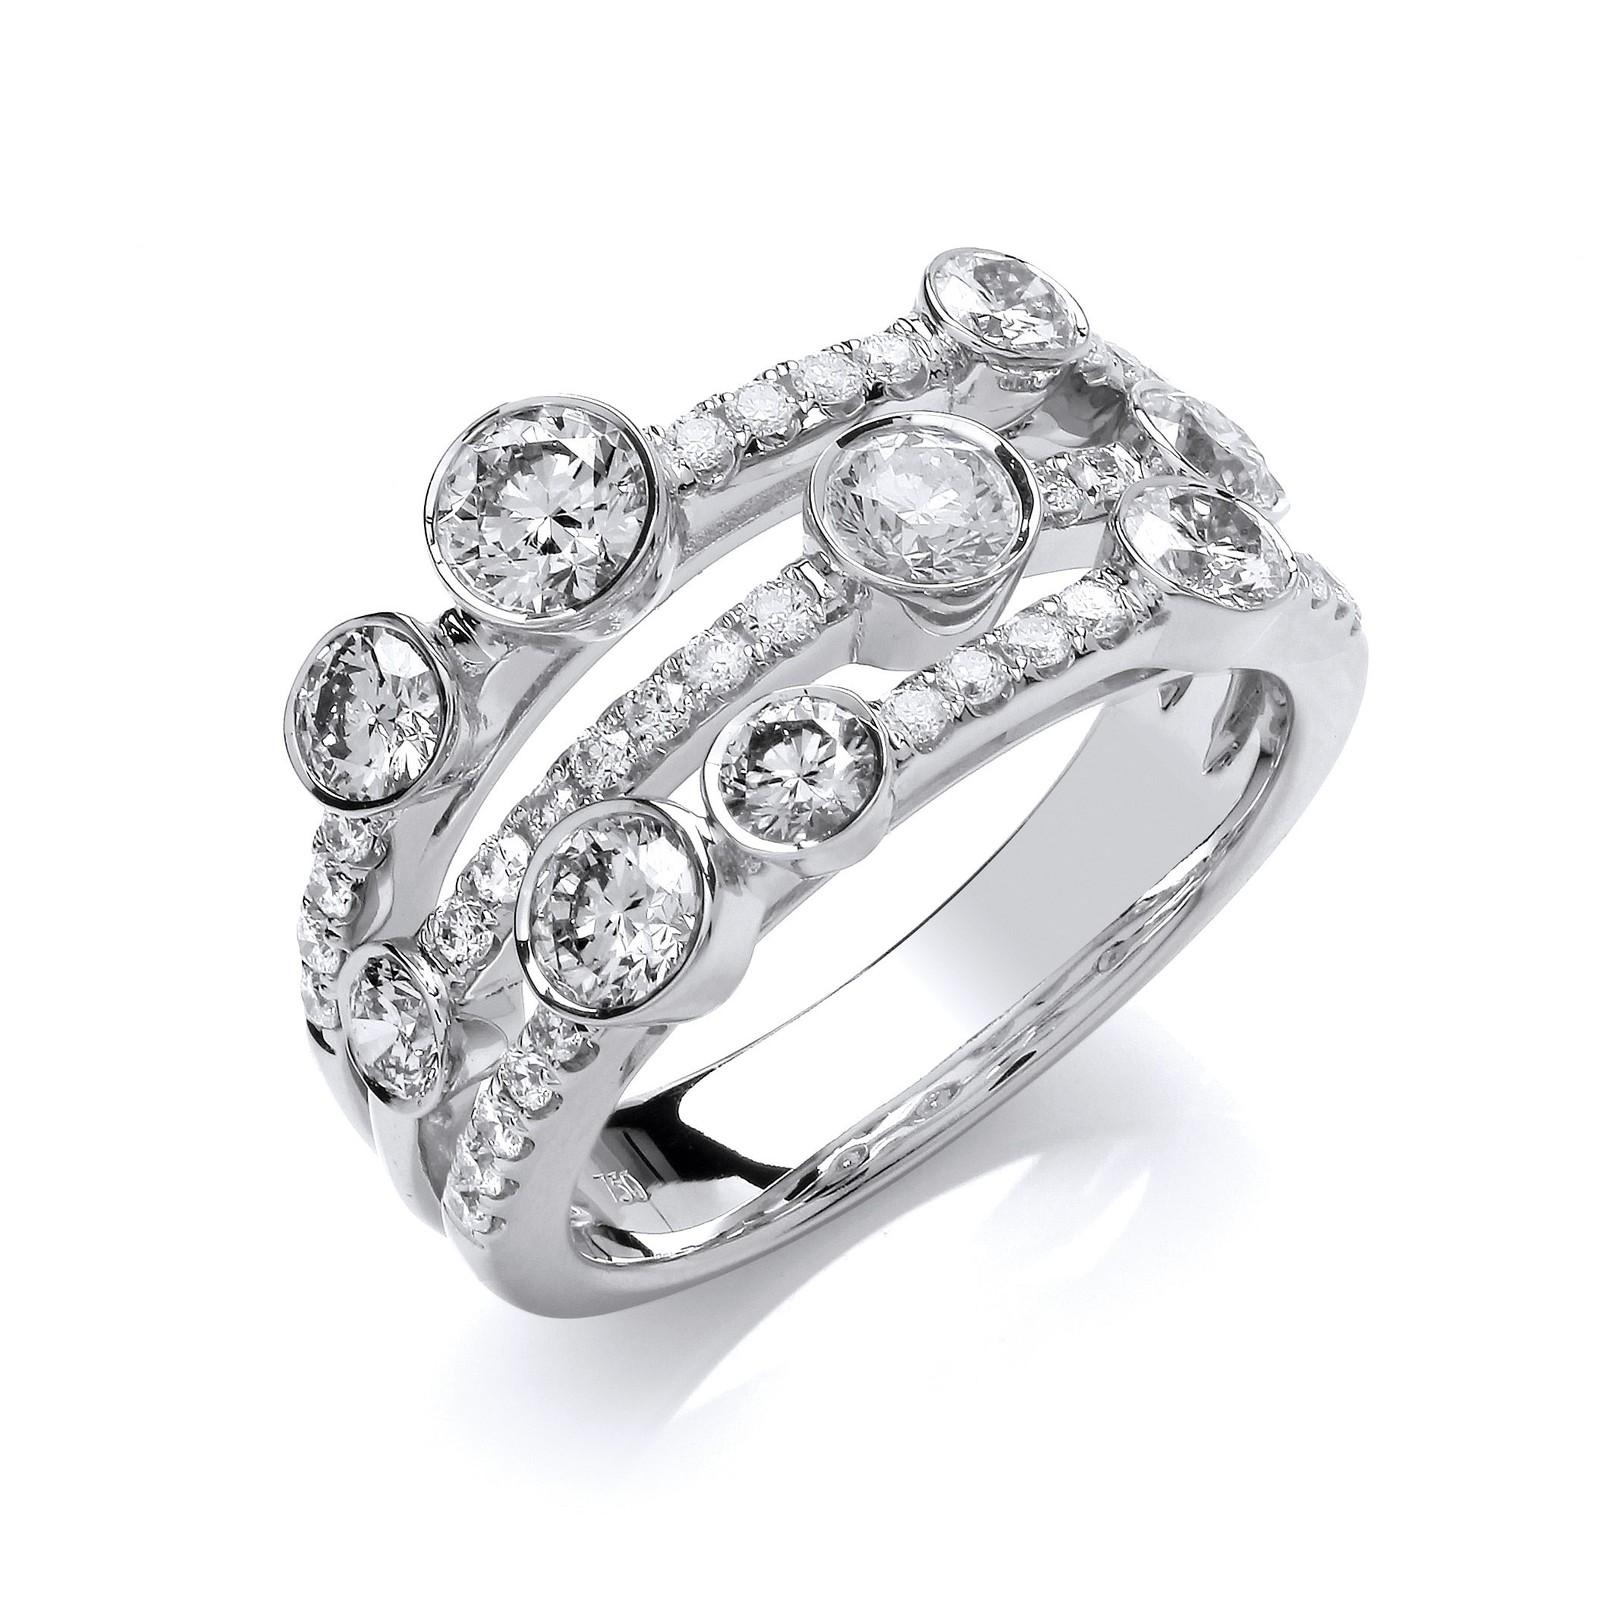 18ct White Gold 1.60ct GH-SI Diamond Dress Ring